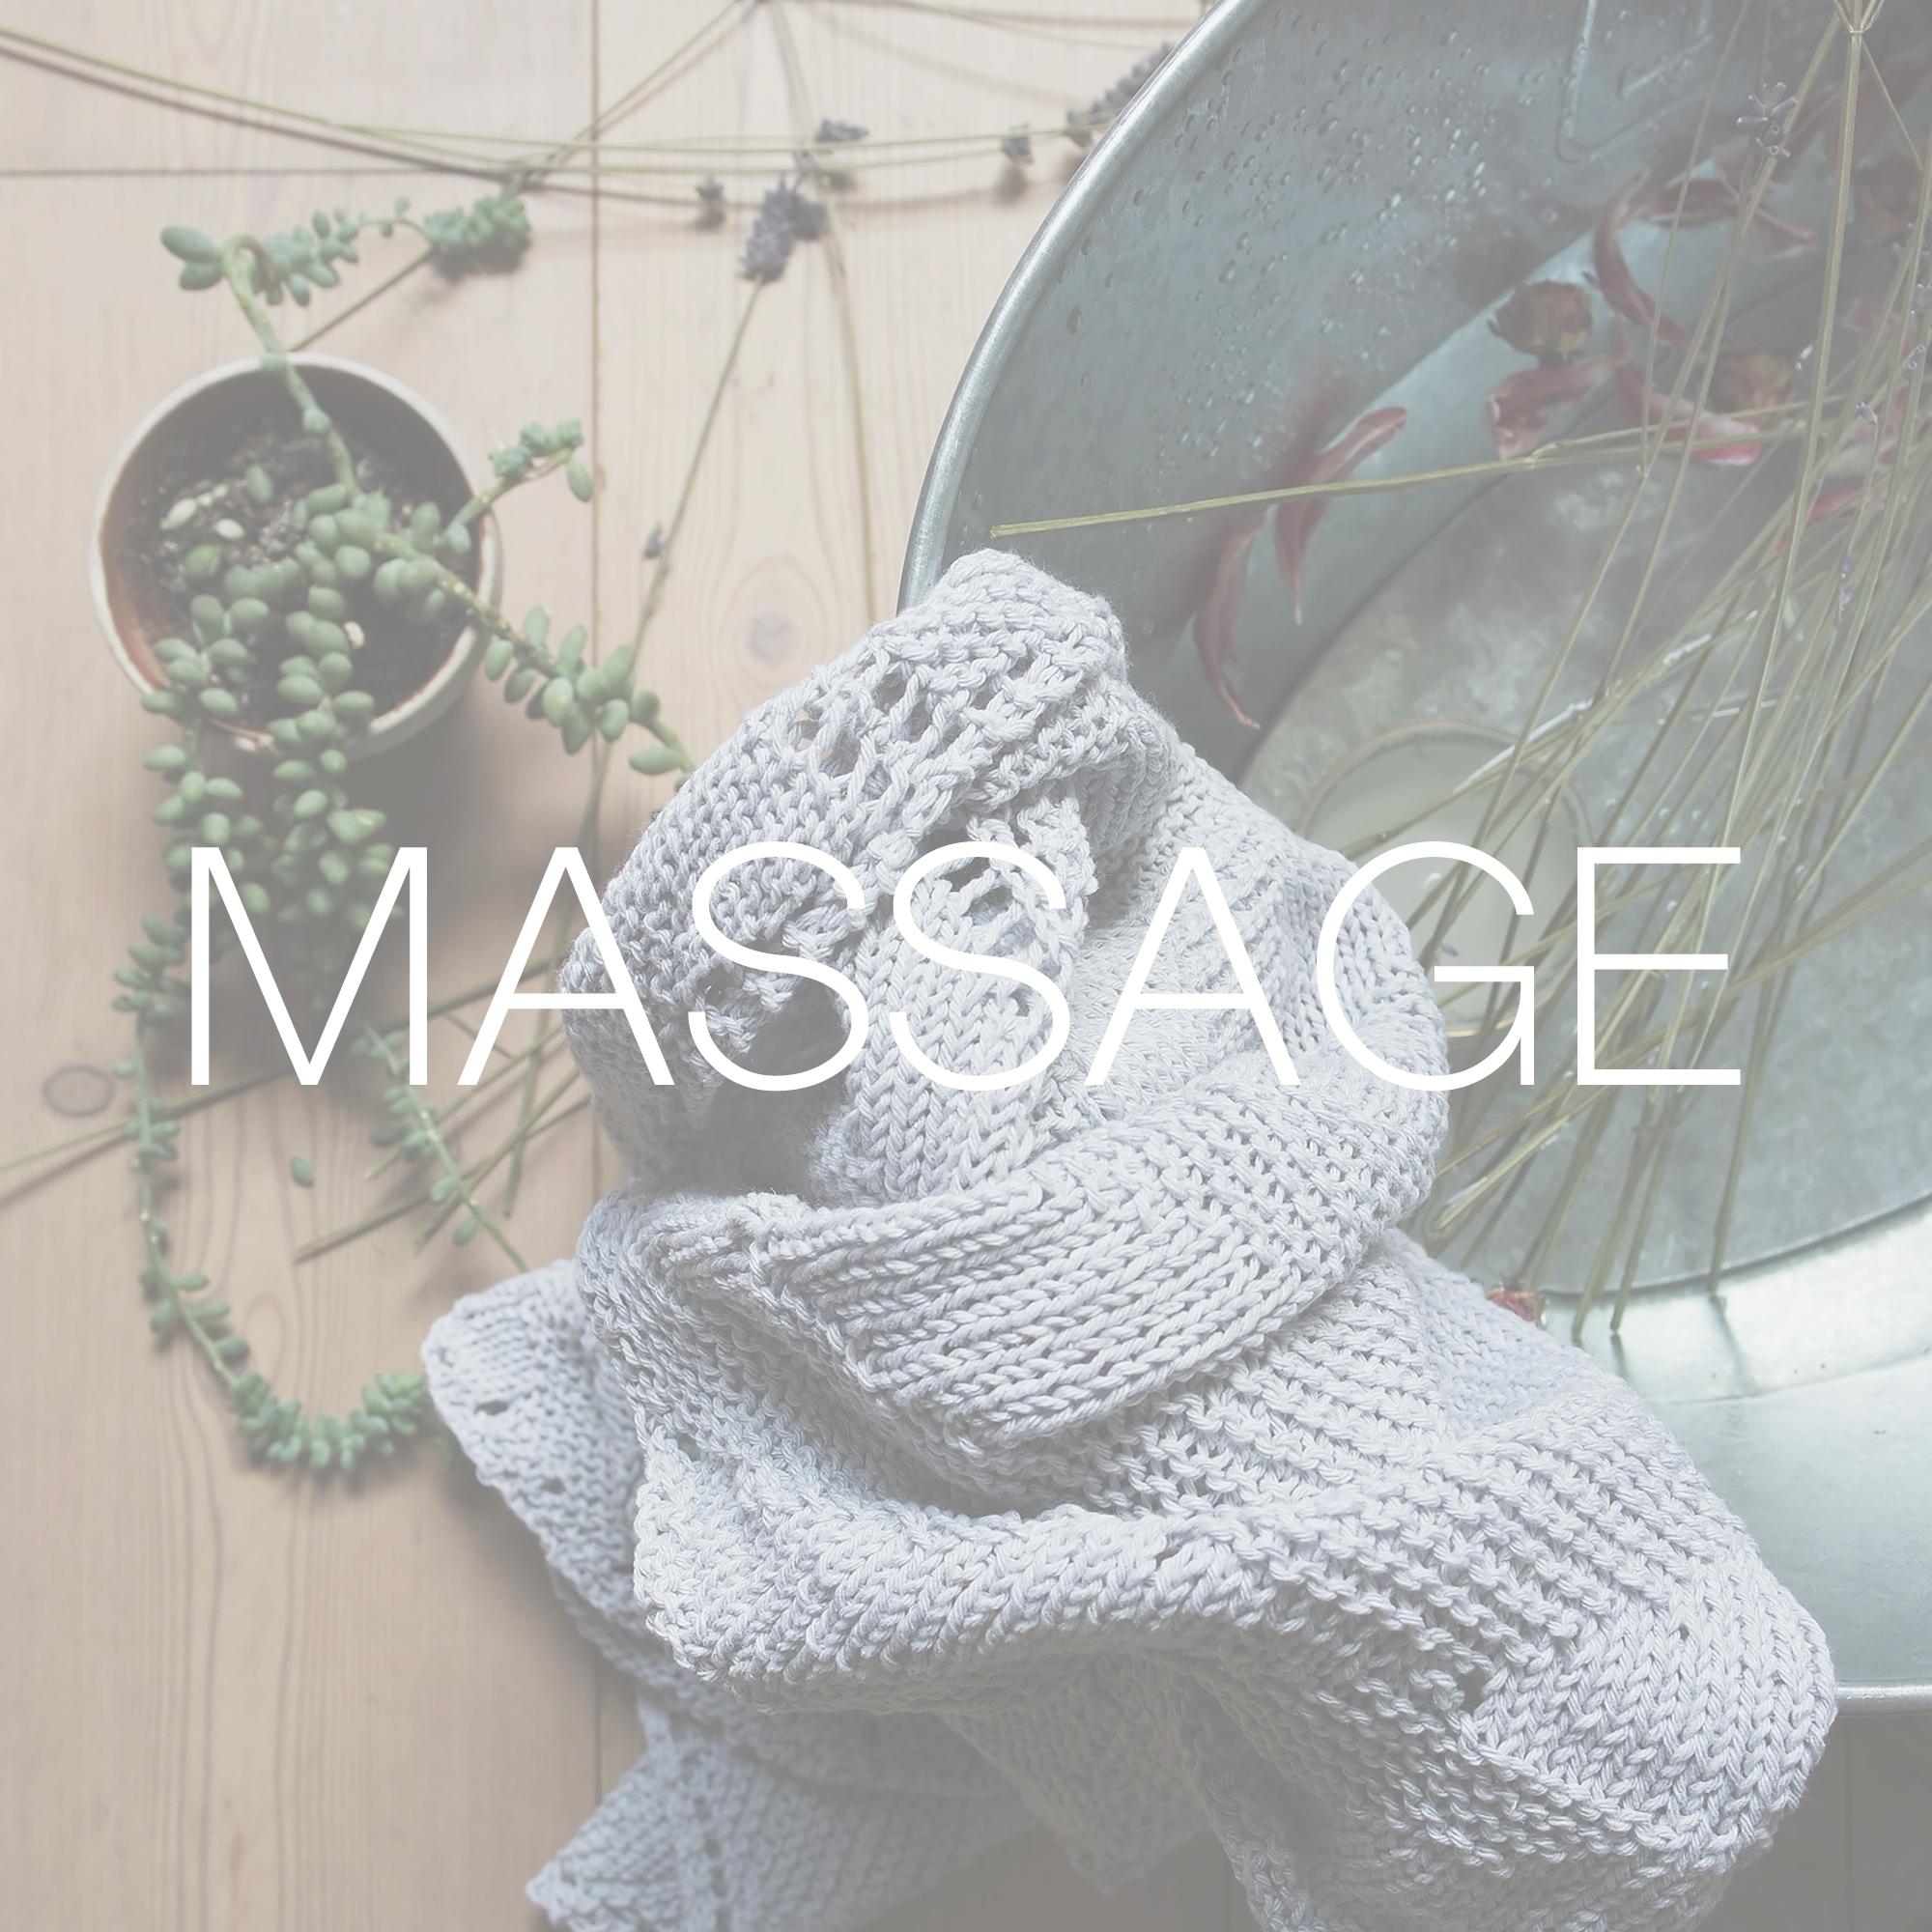 SPAAH Massage Services